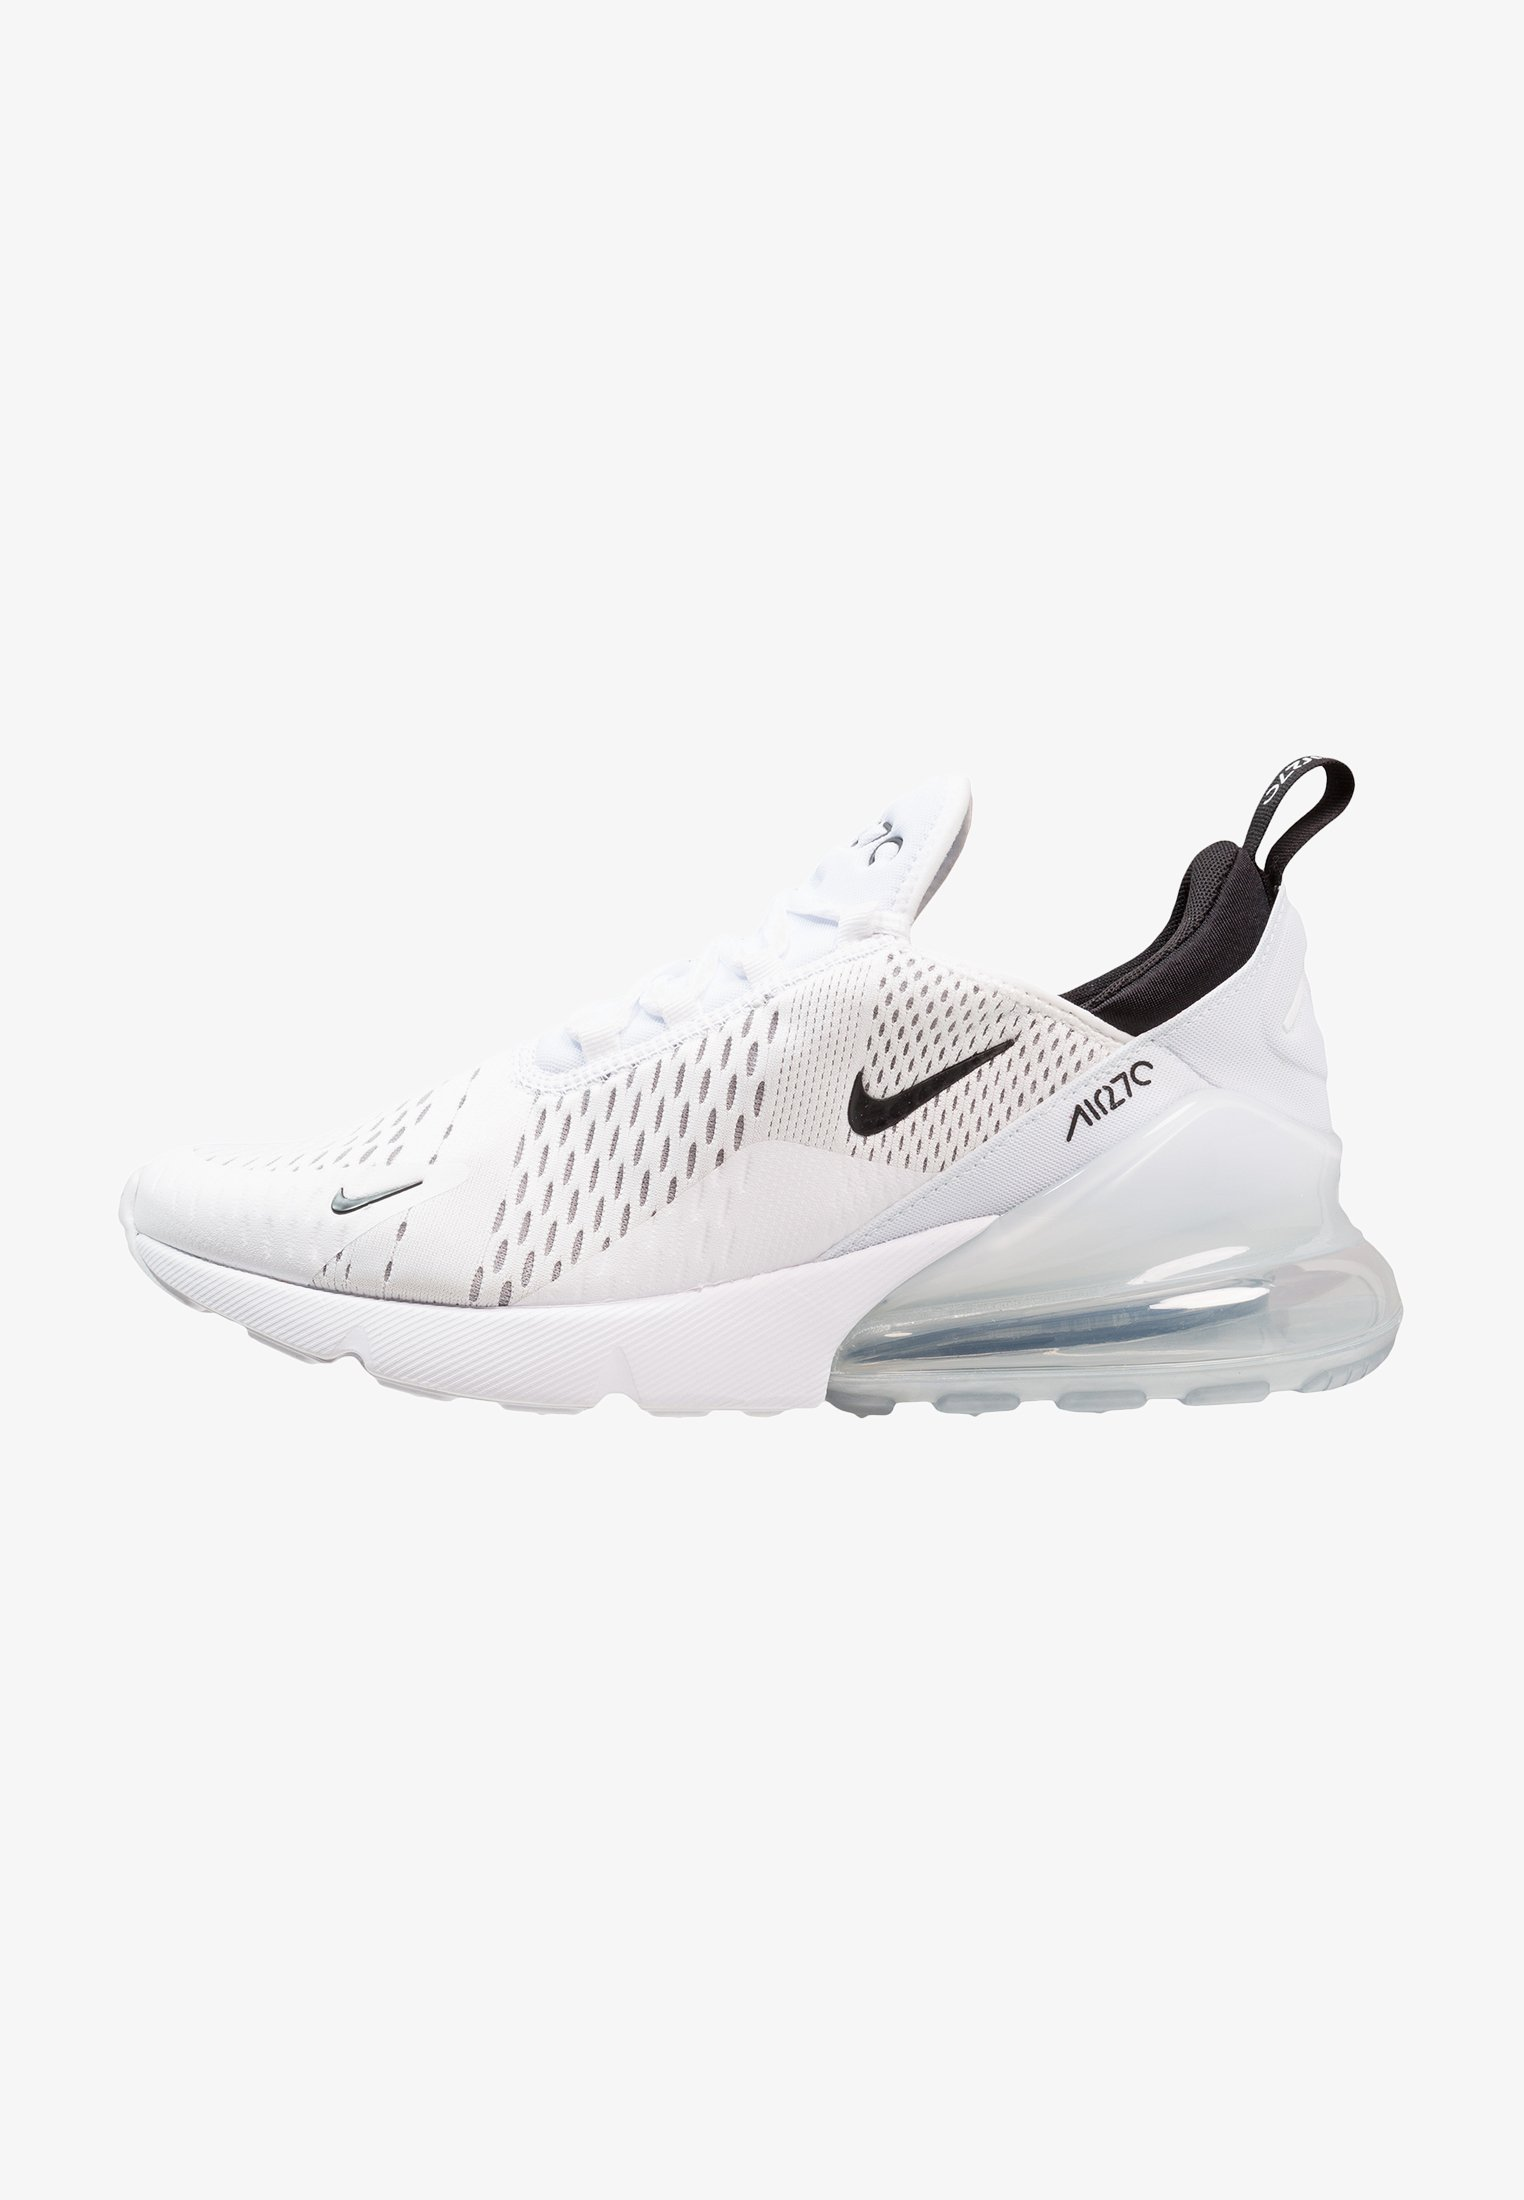 Sinfonía Grapa Discurso  Nike Sportswear AIR MAX 270 - Trainers - white/black/white - Zalando.ie